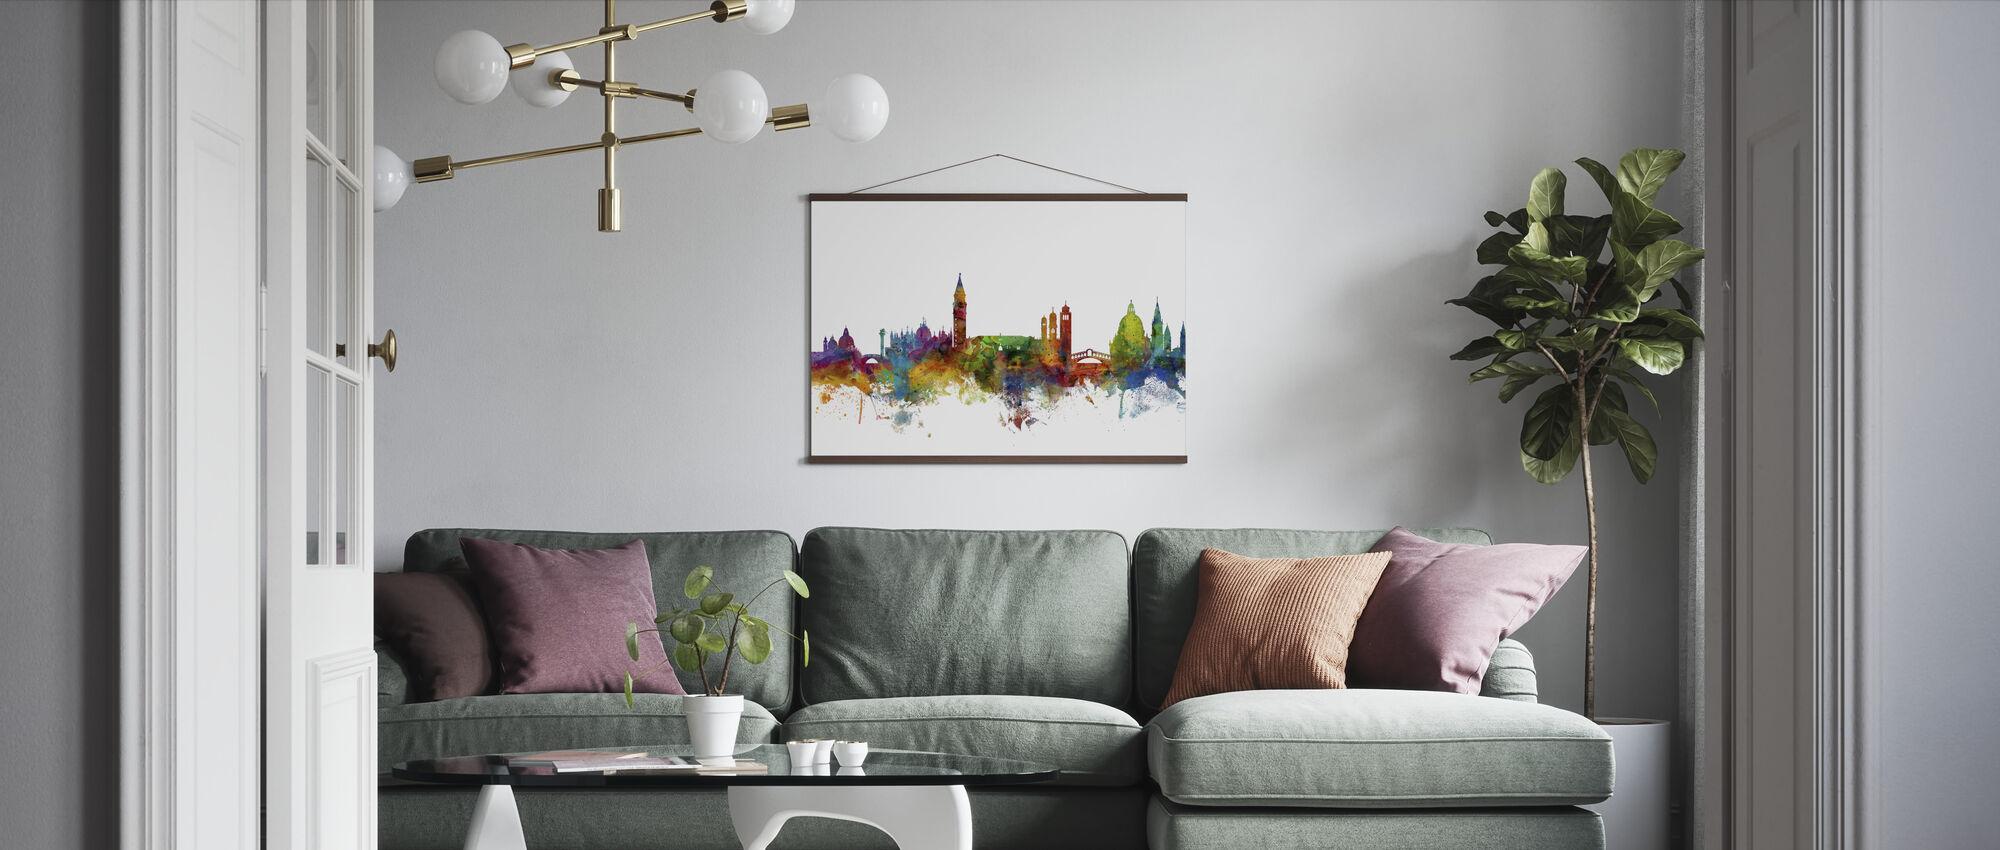 Venice Skyline - Plakat - Stue